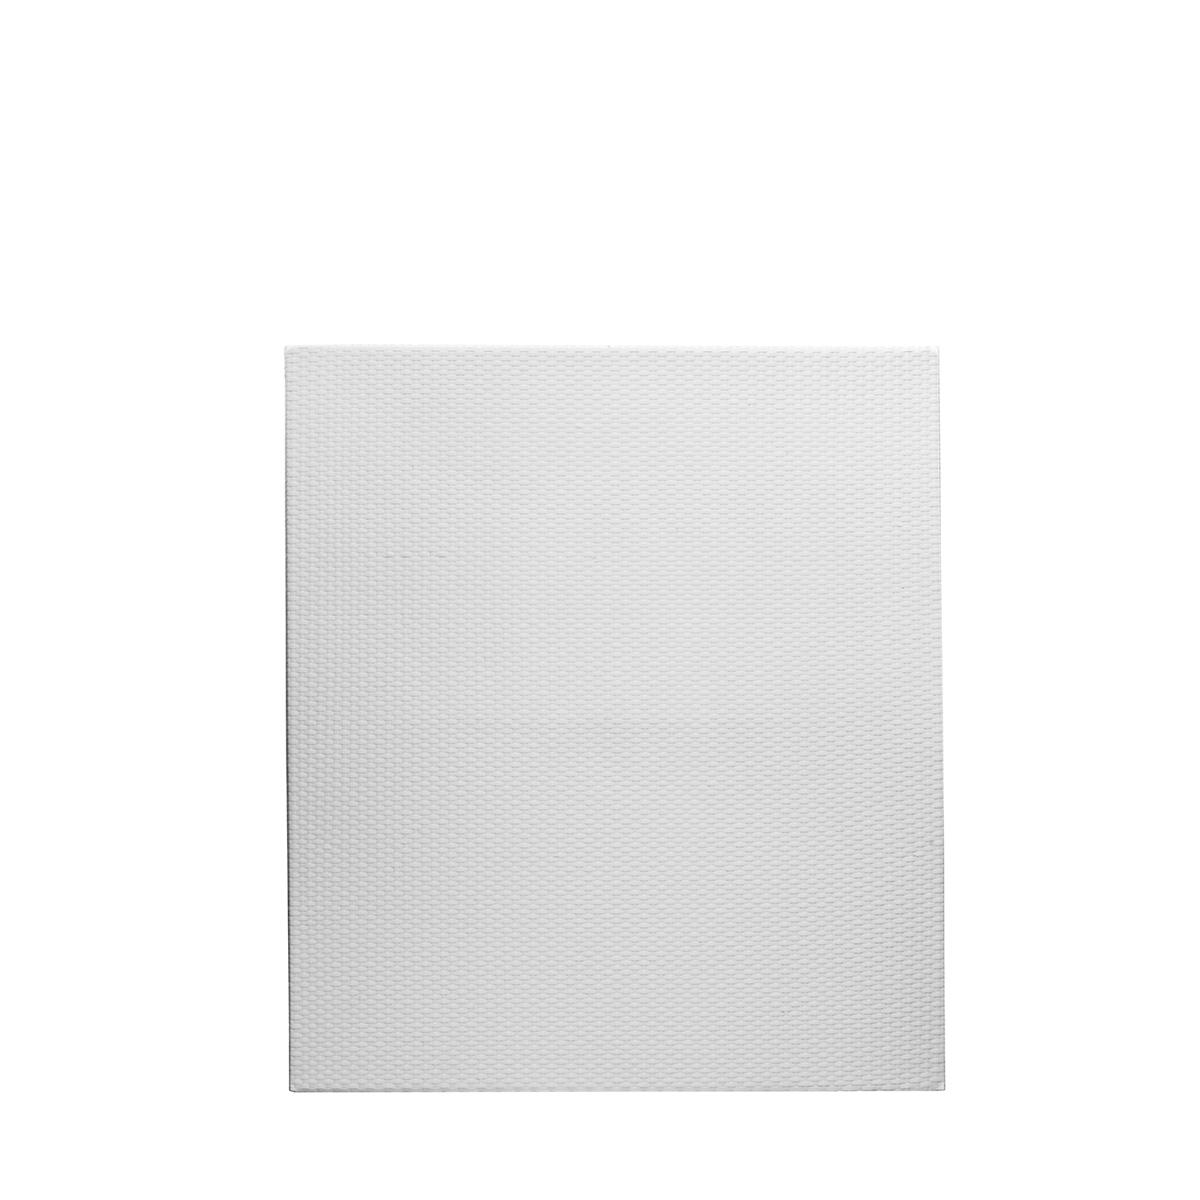 Polyrattan Zaun Element 80 x 90 cm, weiß, Alu Rahmen, wetterfest ...